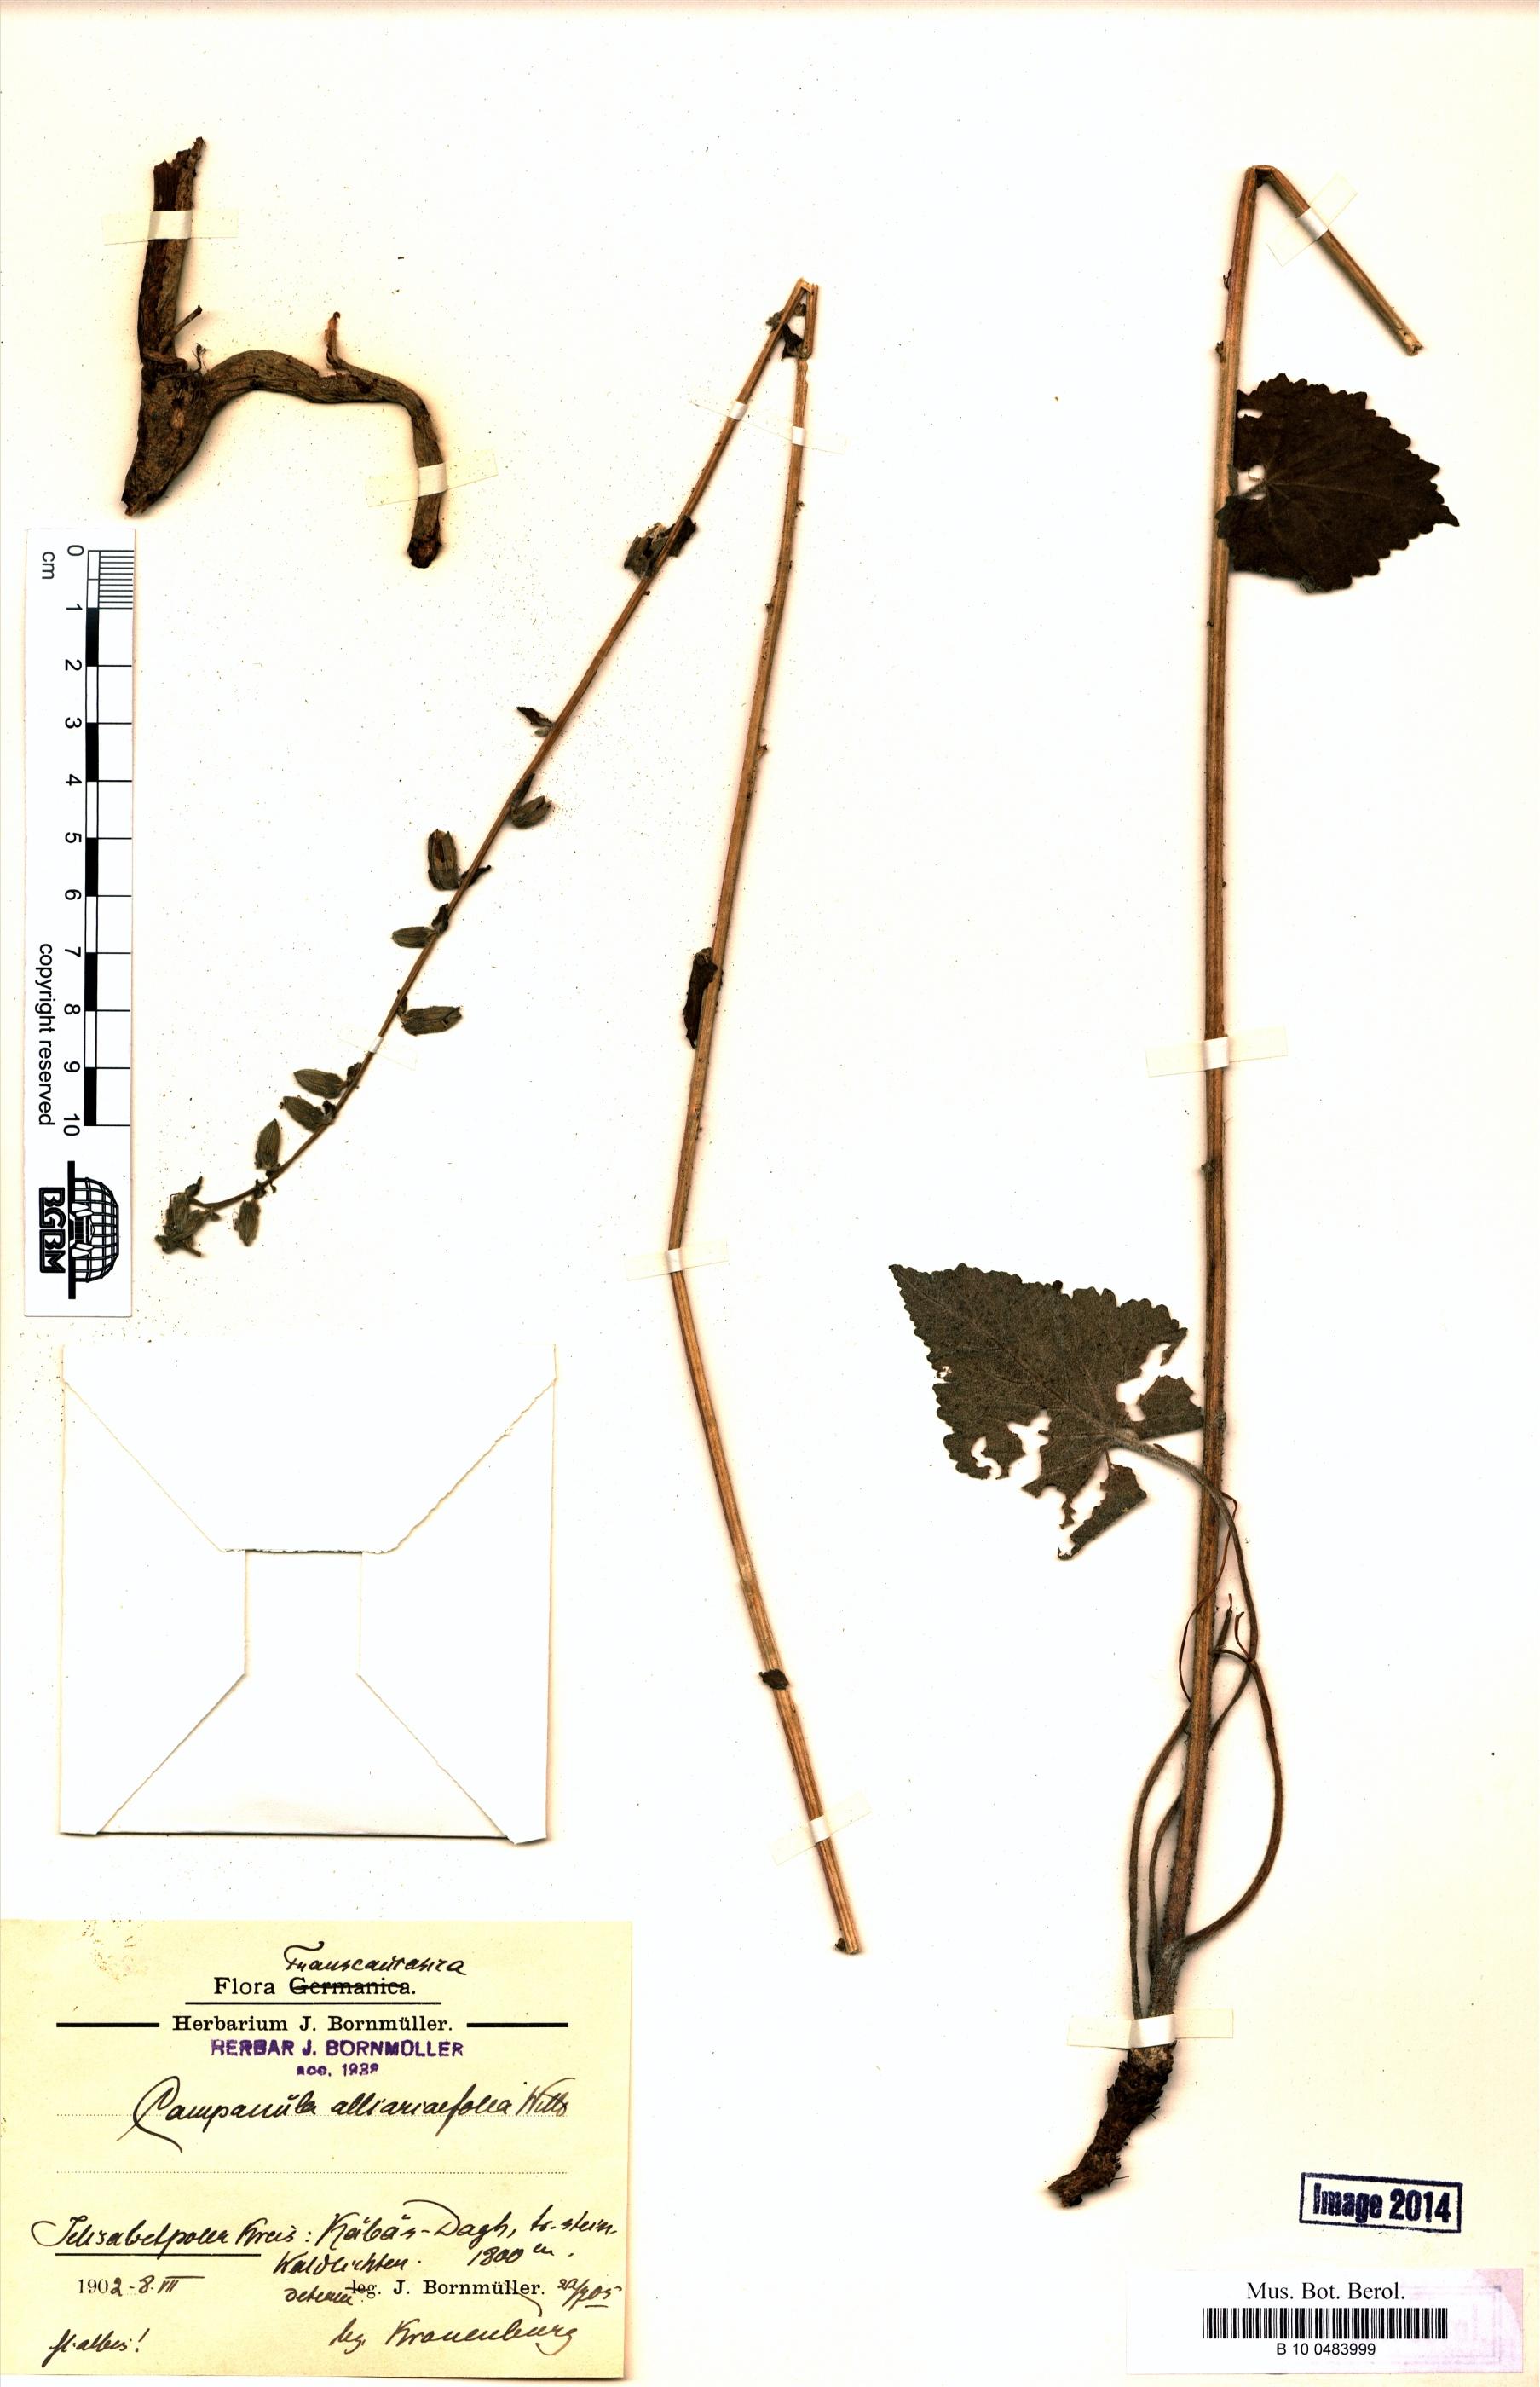 http://ww2.bgbm.org/herbarium/images/B/10/04/83/99/B_10_0483999.jpg